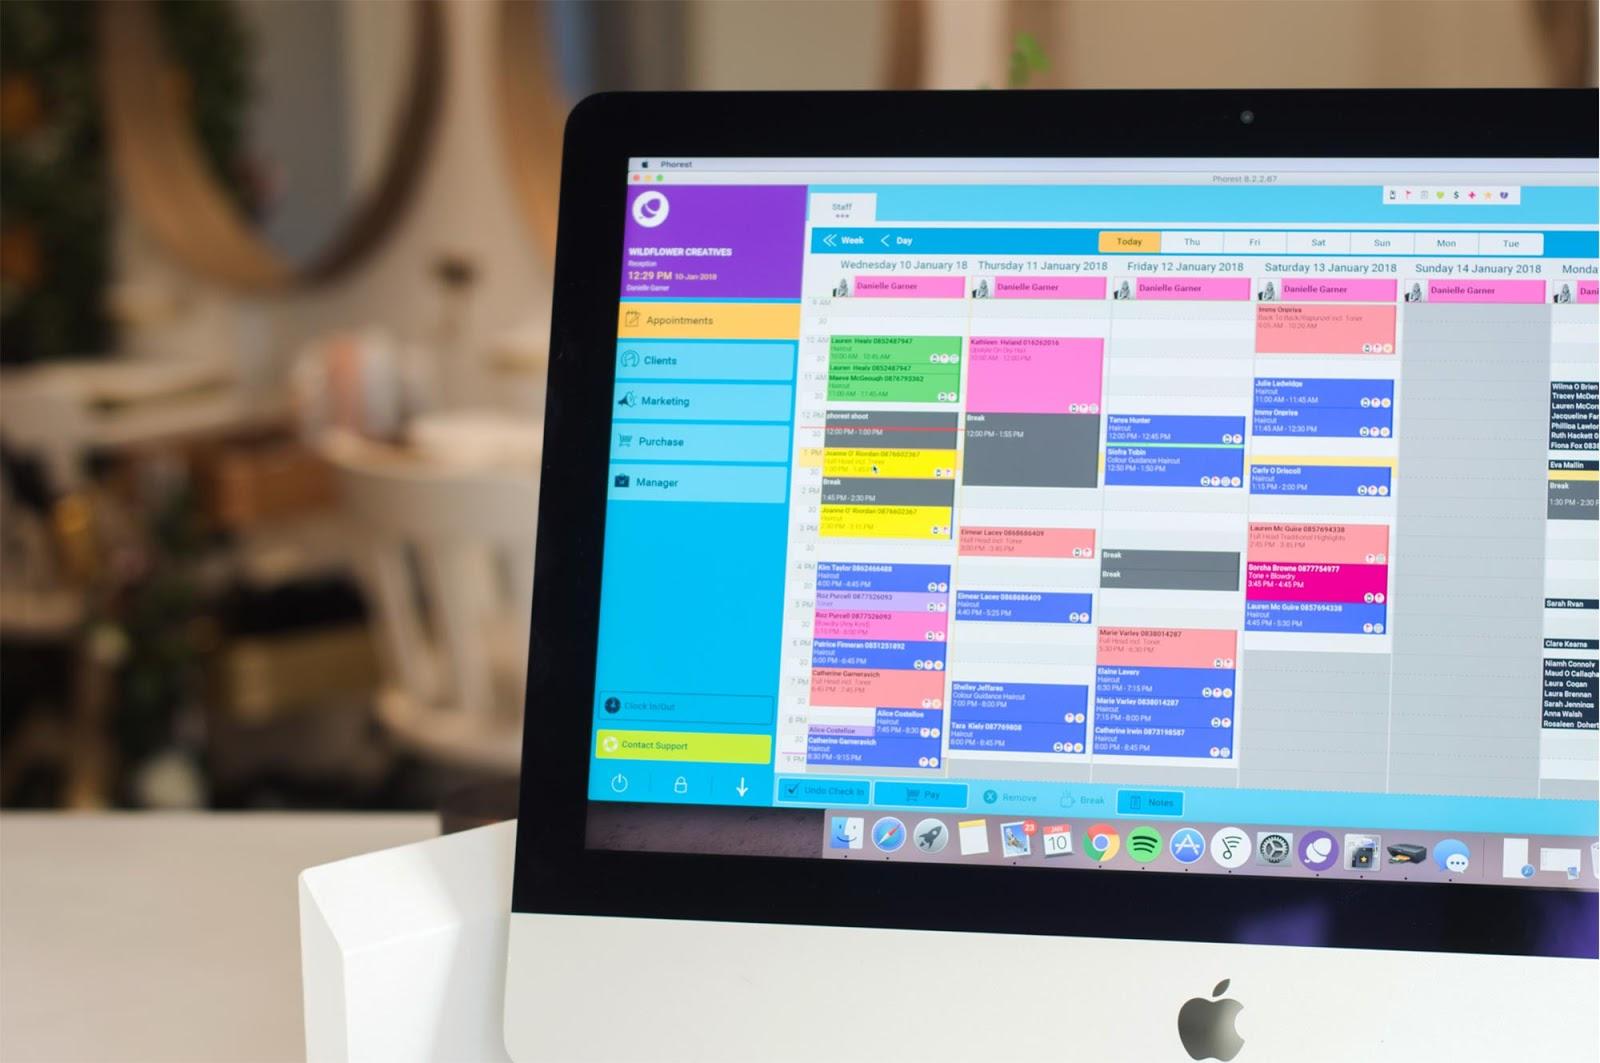 Apple desktop computer showing the Phorest Salon Software inventory management tool.